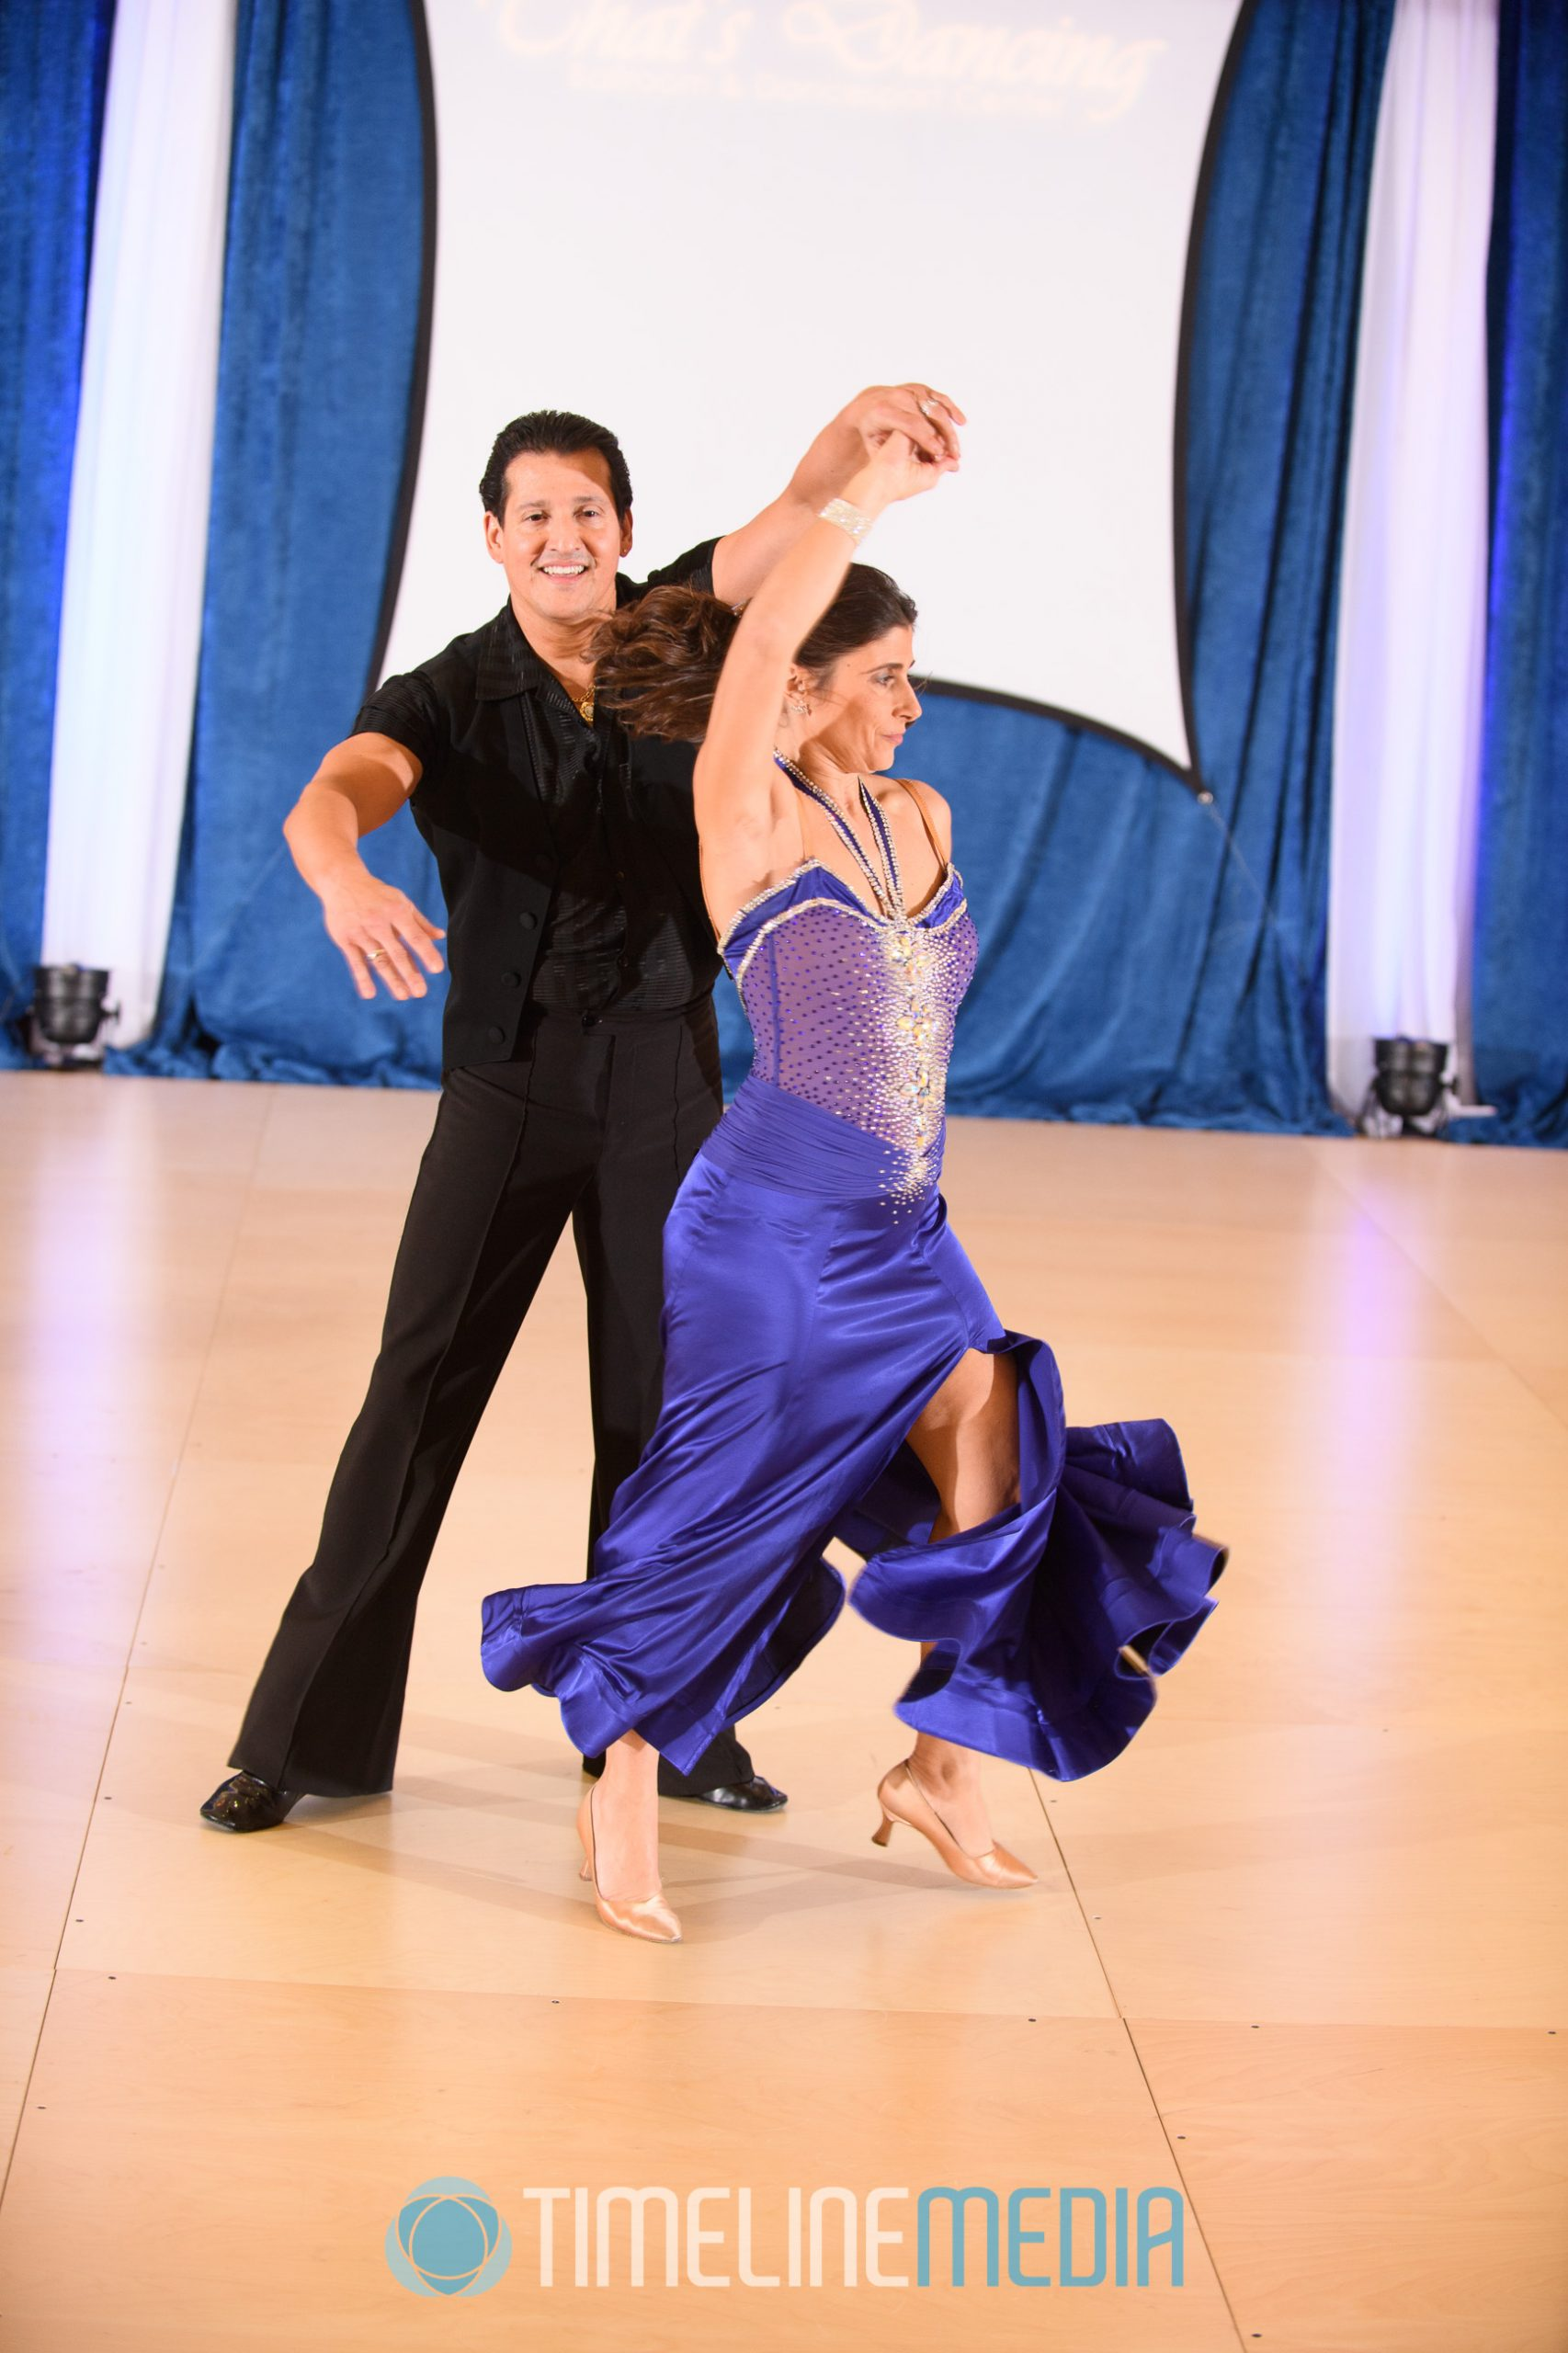 Holiday showcase dance routine Columbia, Maryland ©TimeLine Media